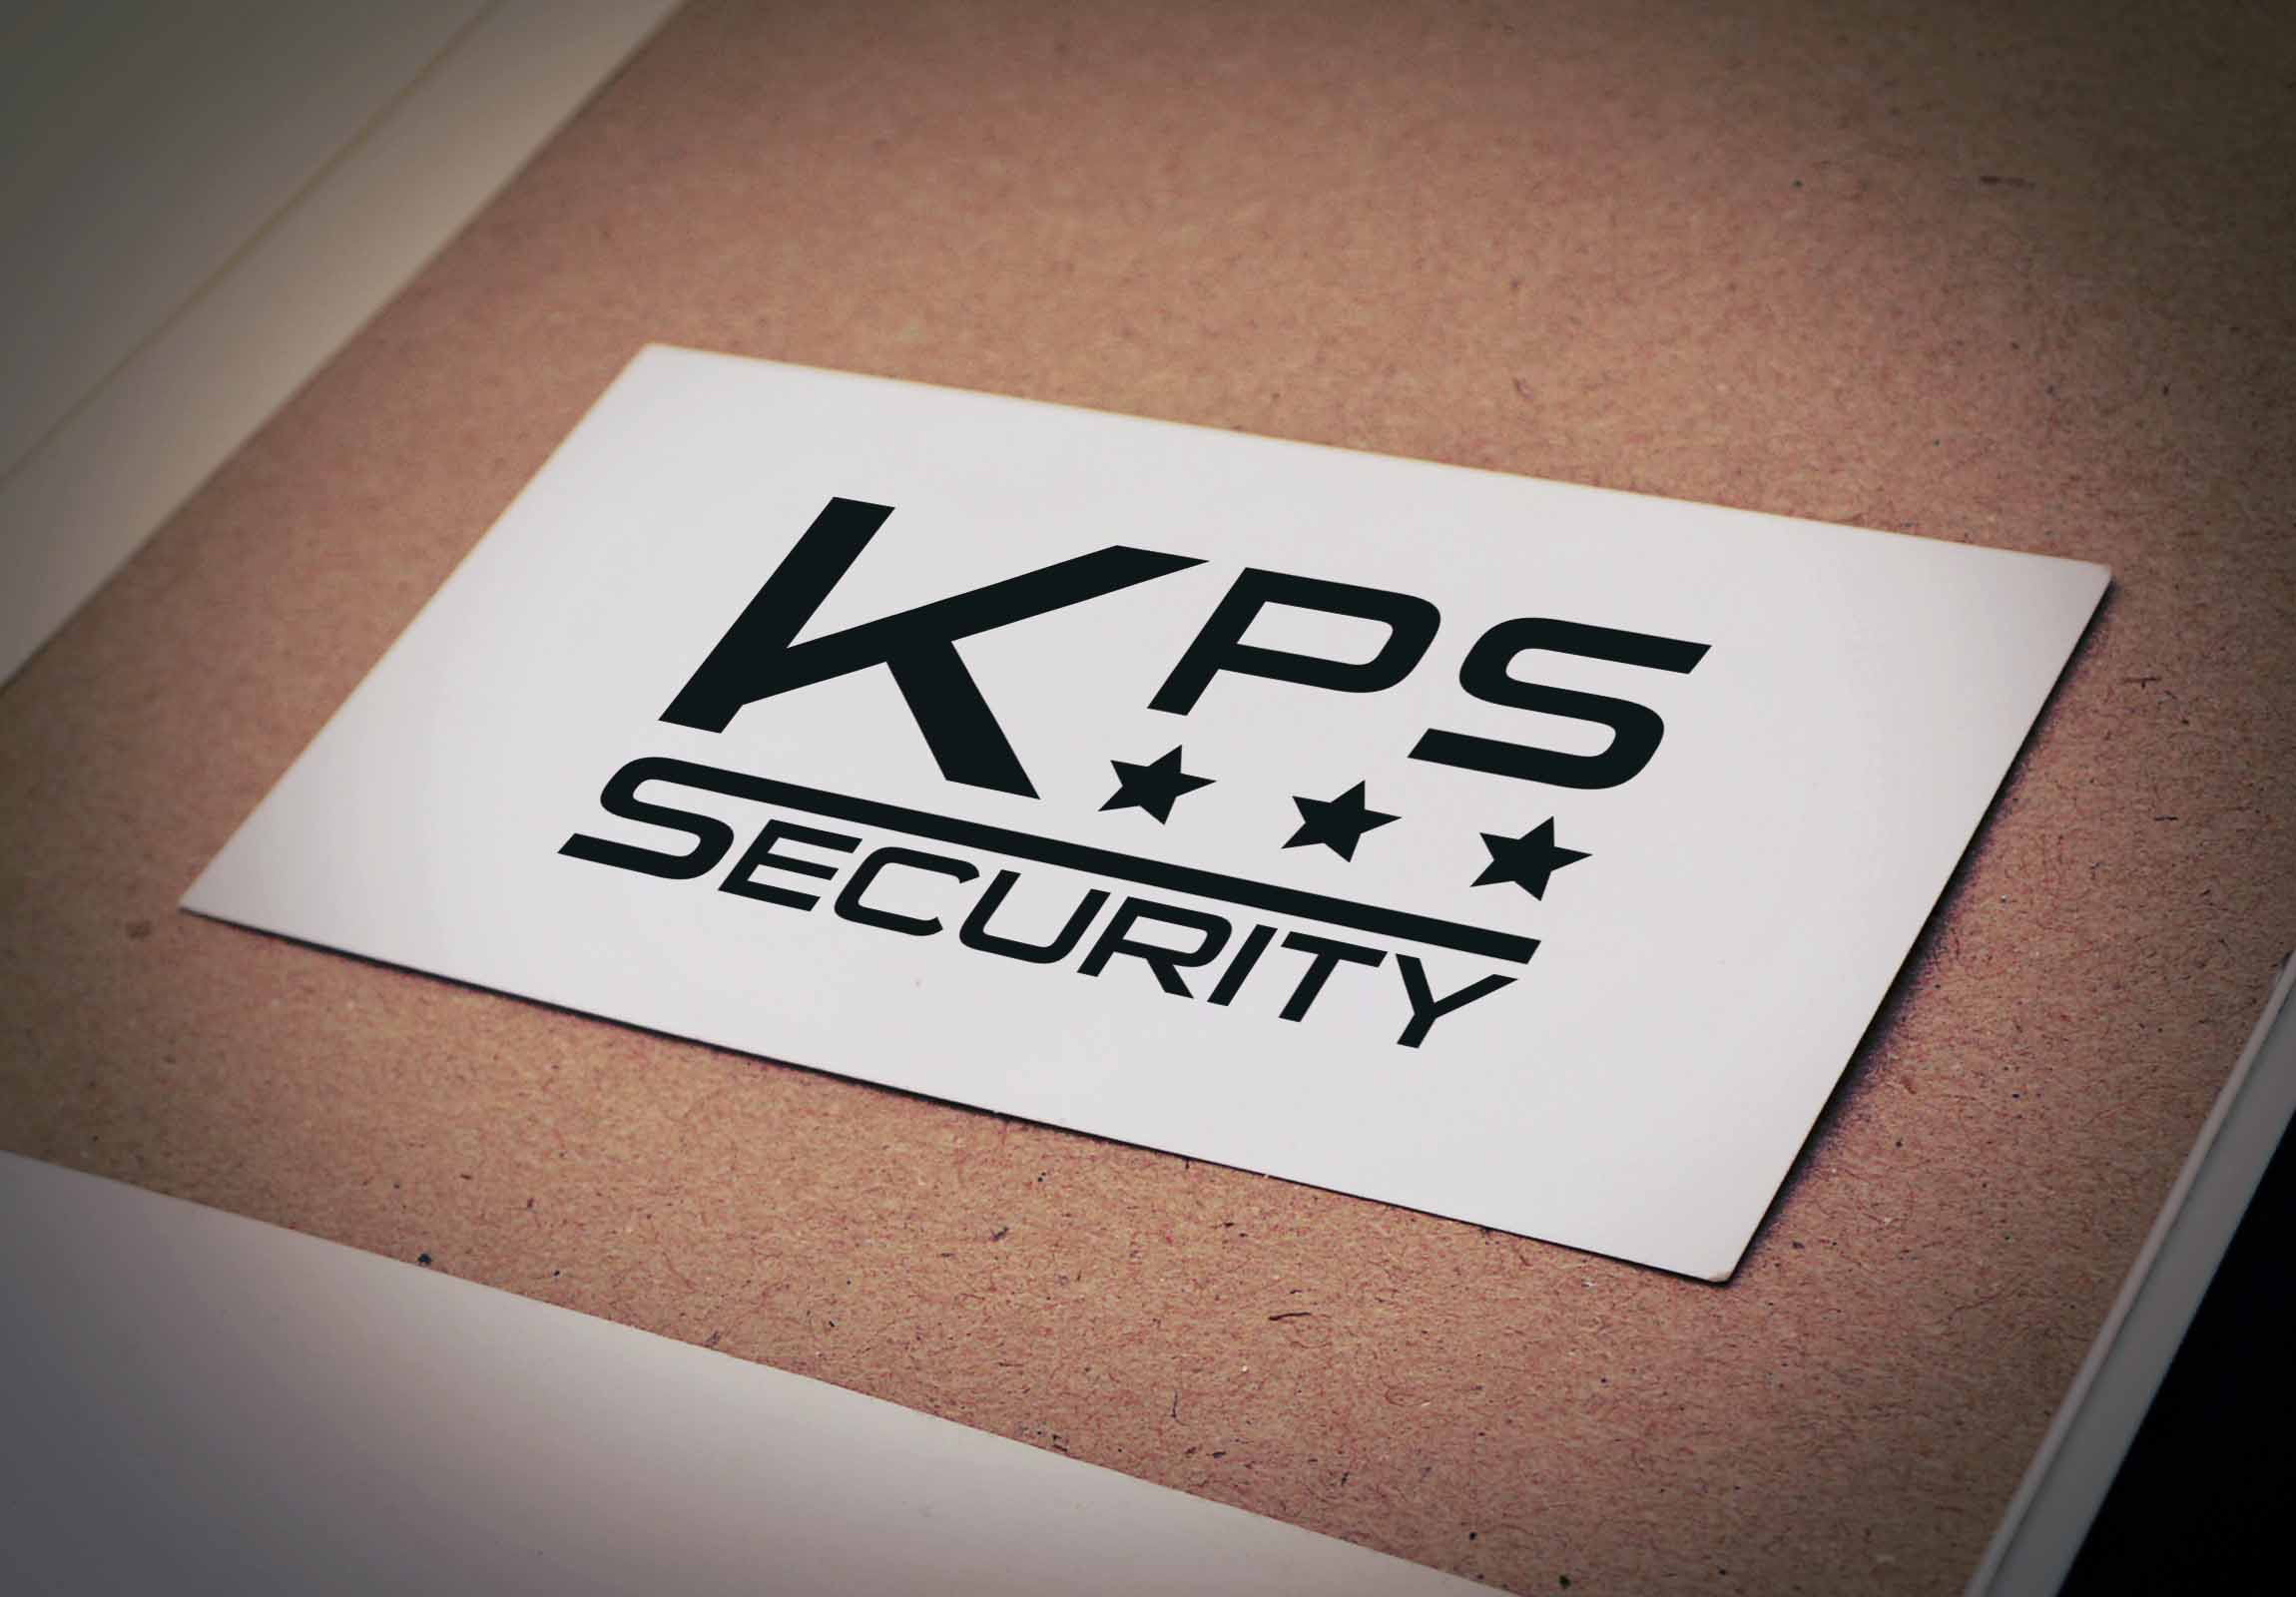 Logo KPS Security Offenburg Ortenau